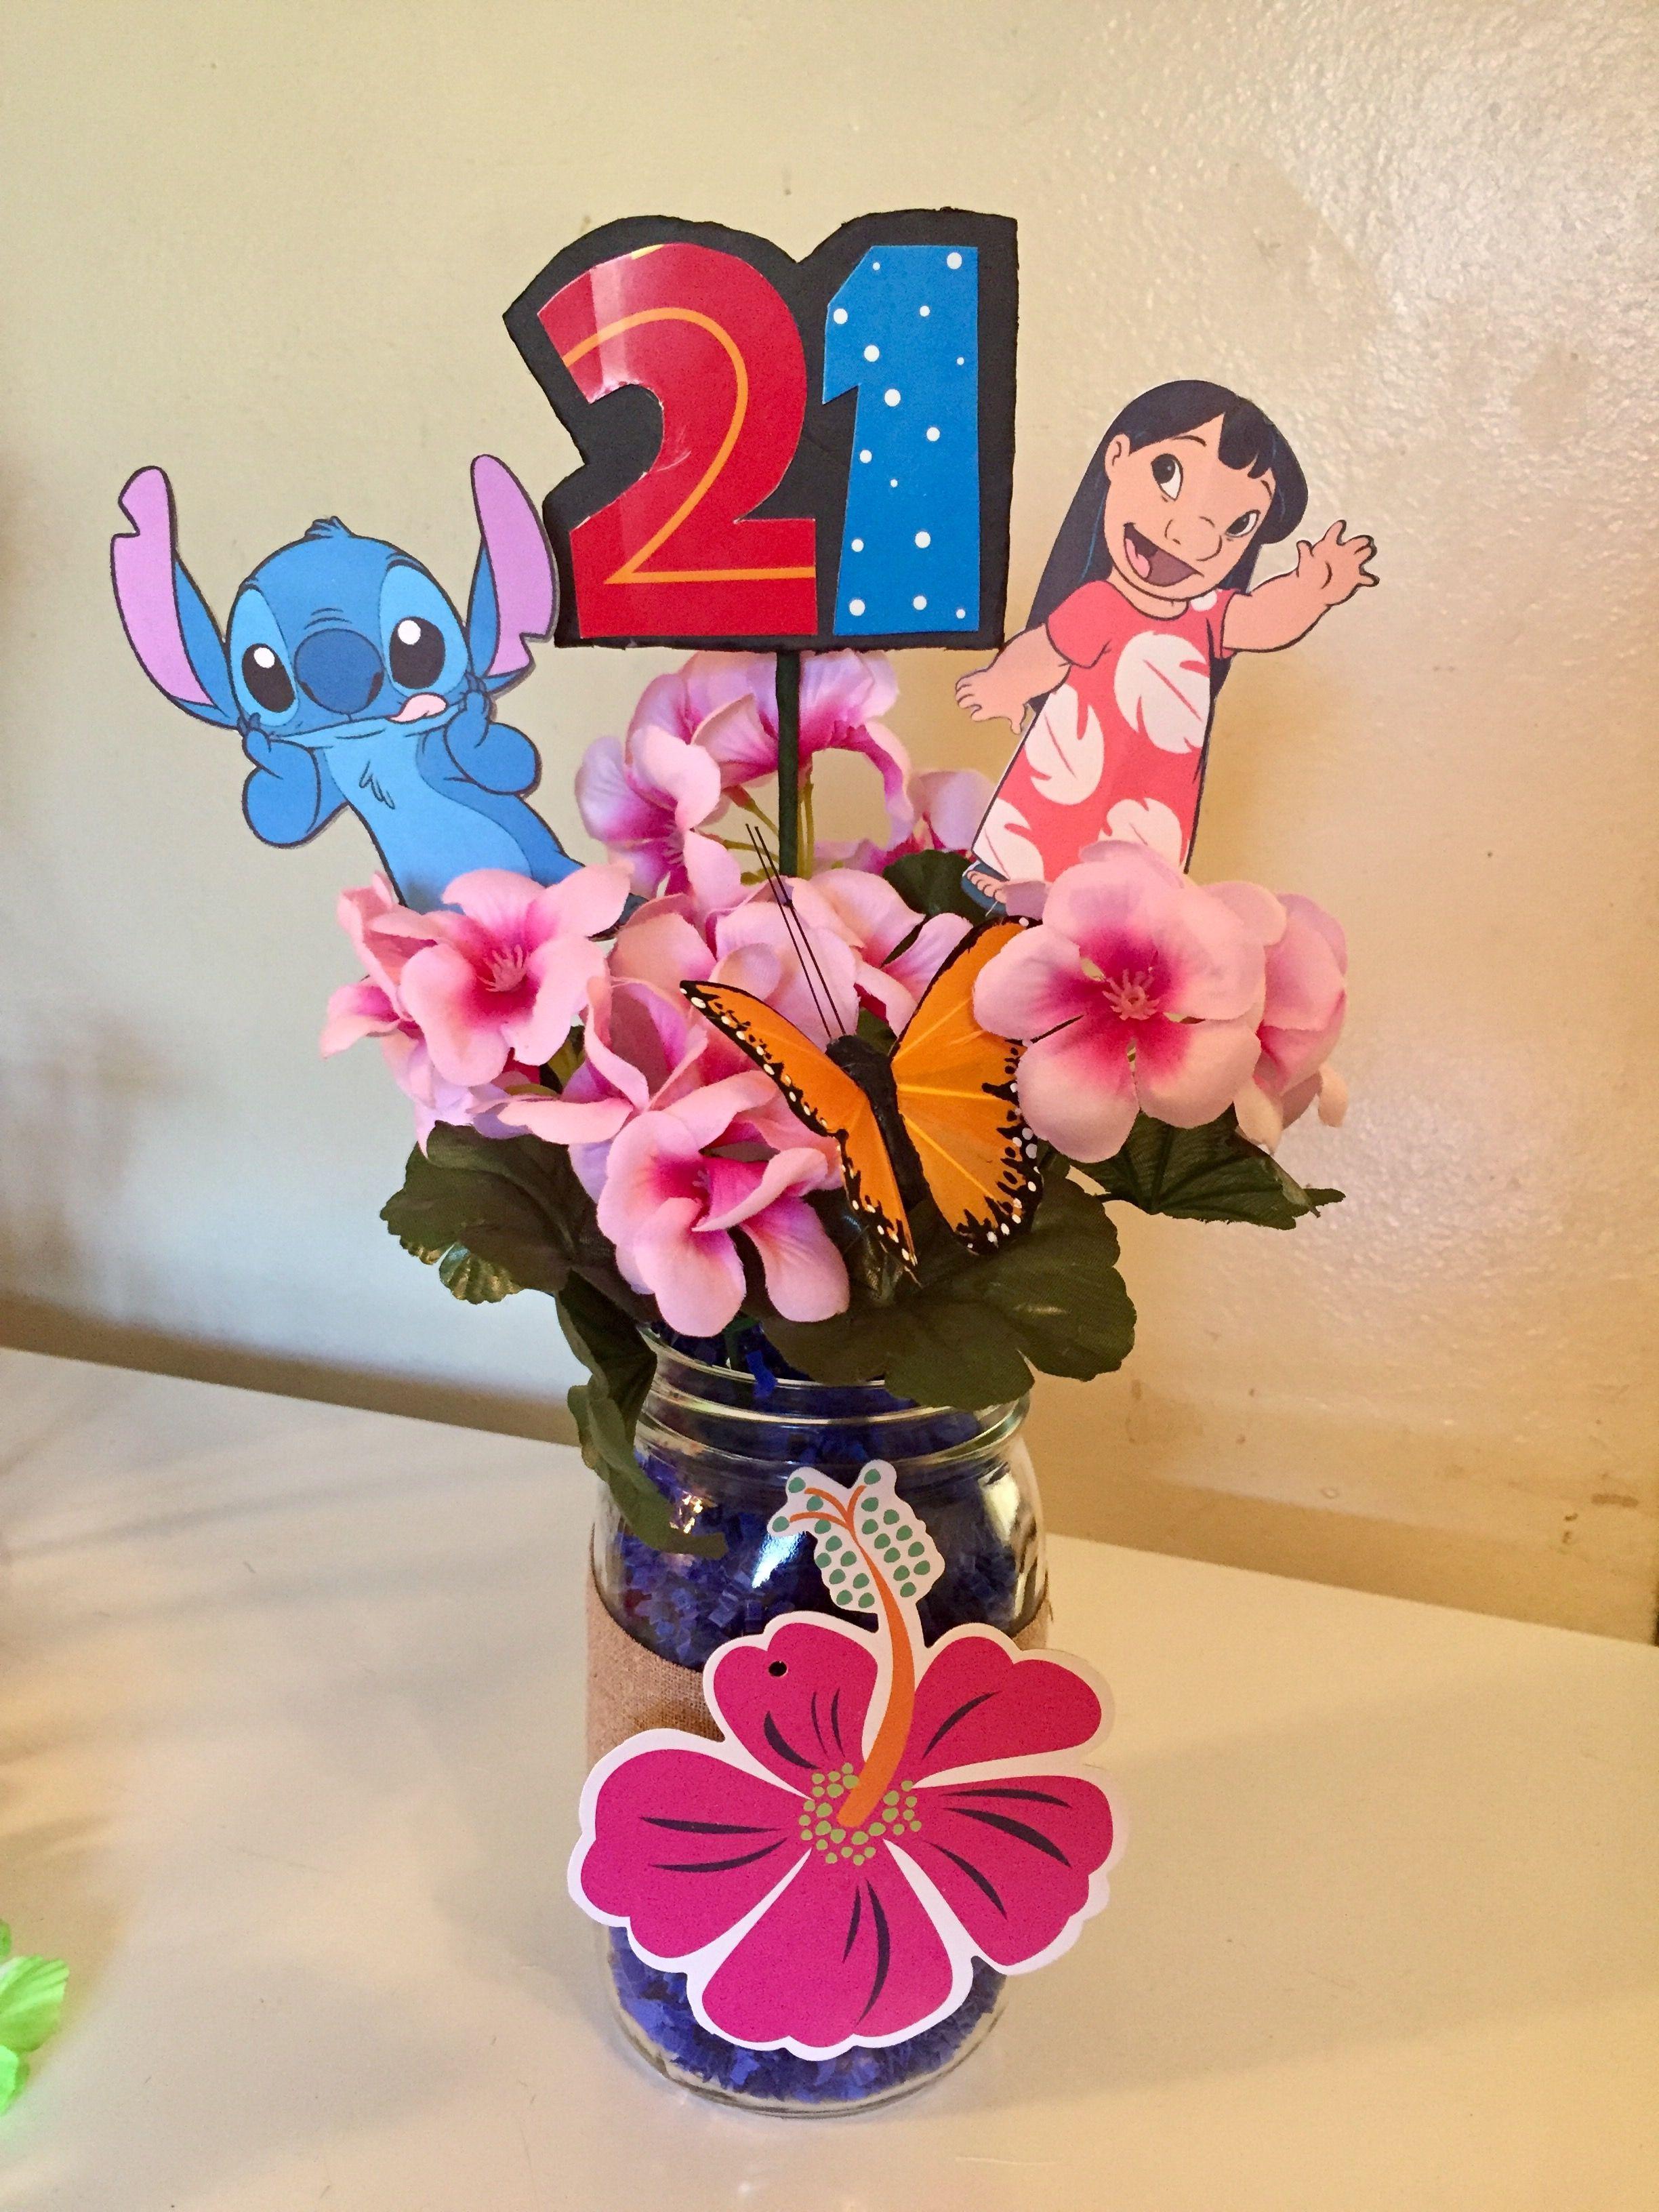 Luau Lilo And Stitch Party Centerpiece Baby Shower Pinterest